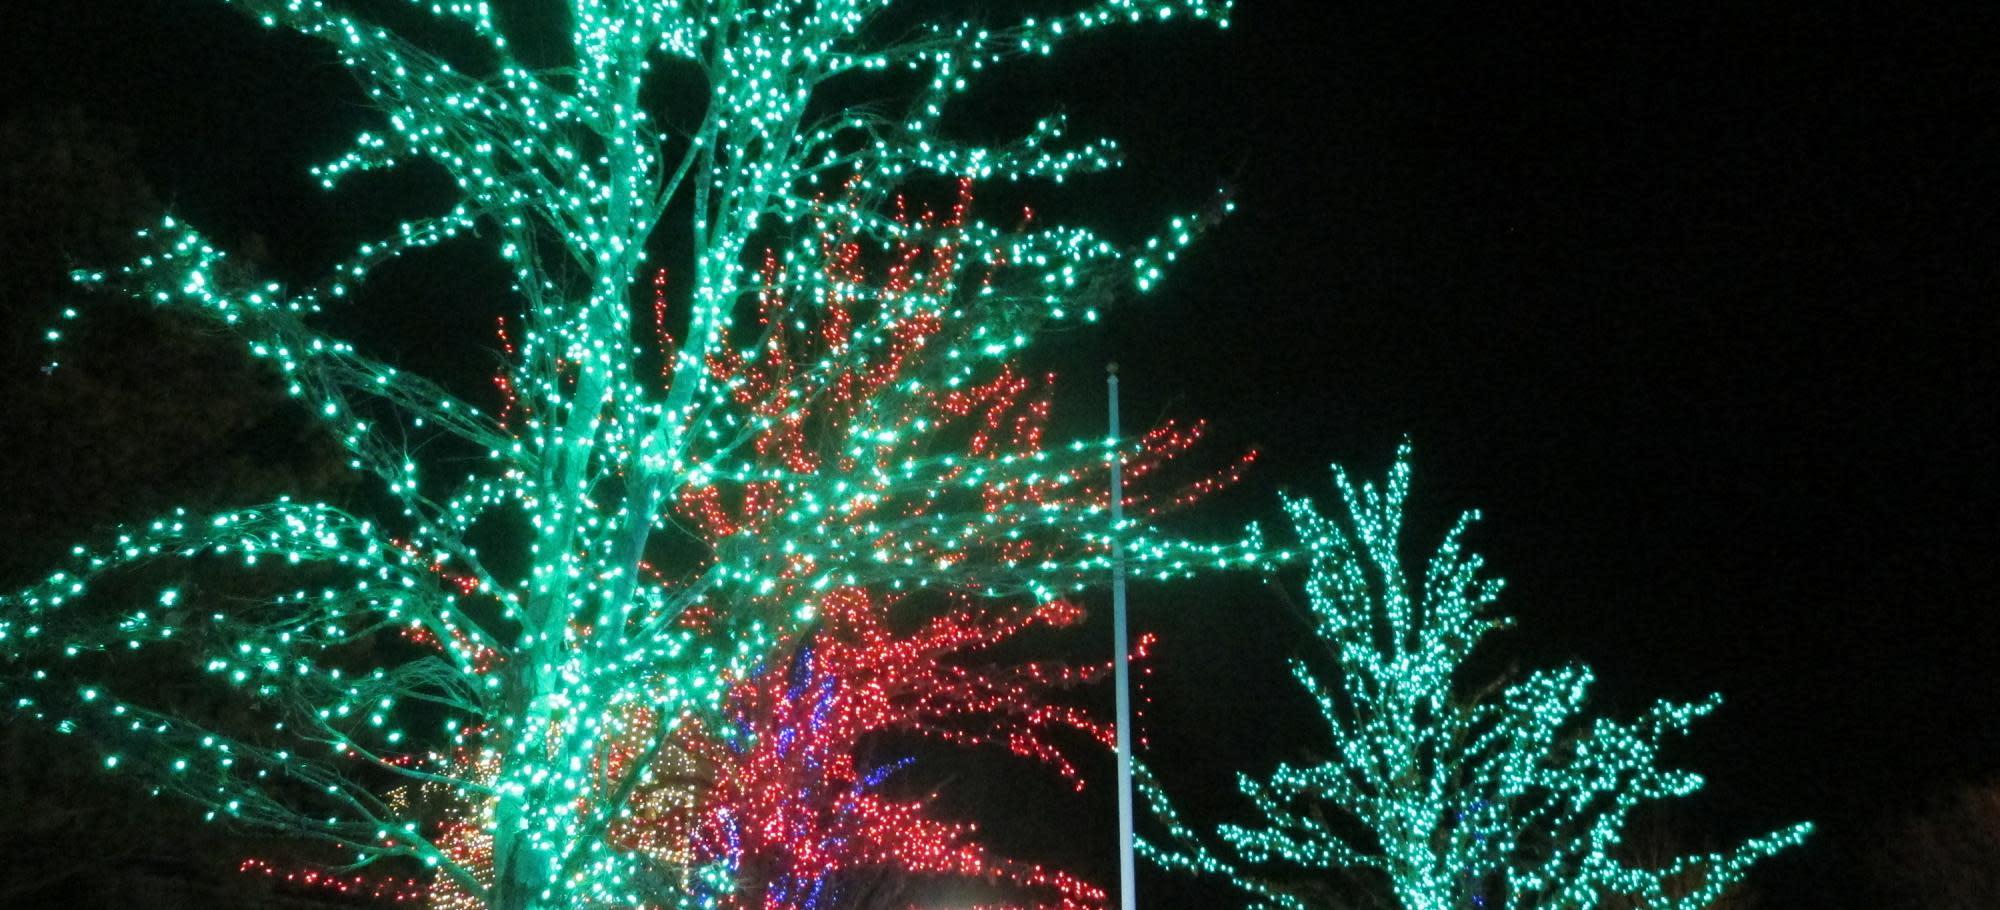 christmas lights of denver - Church Of The Highlands Christmas